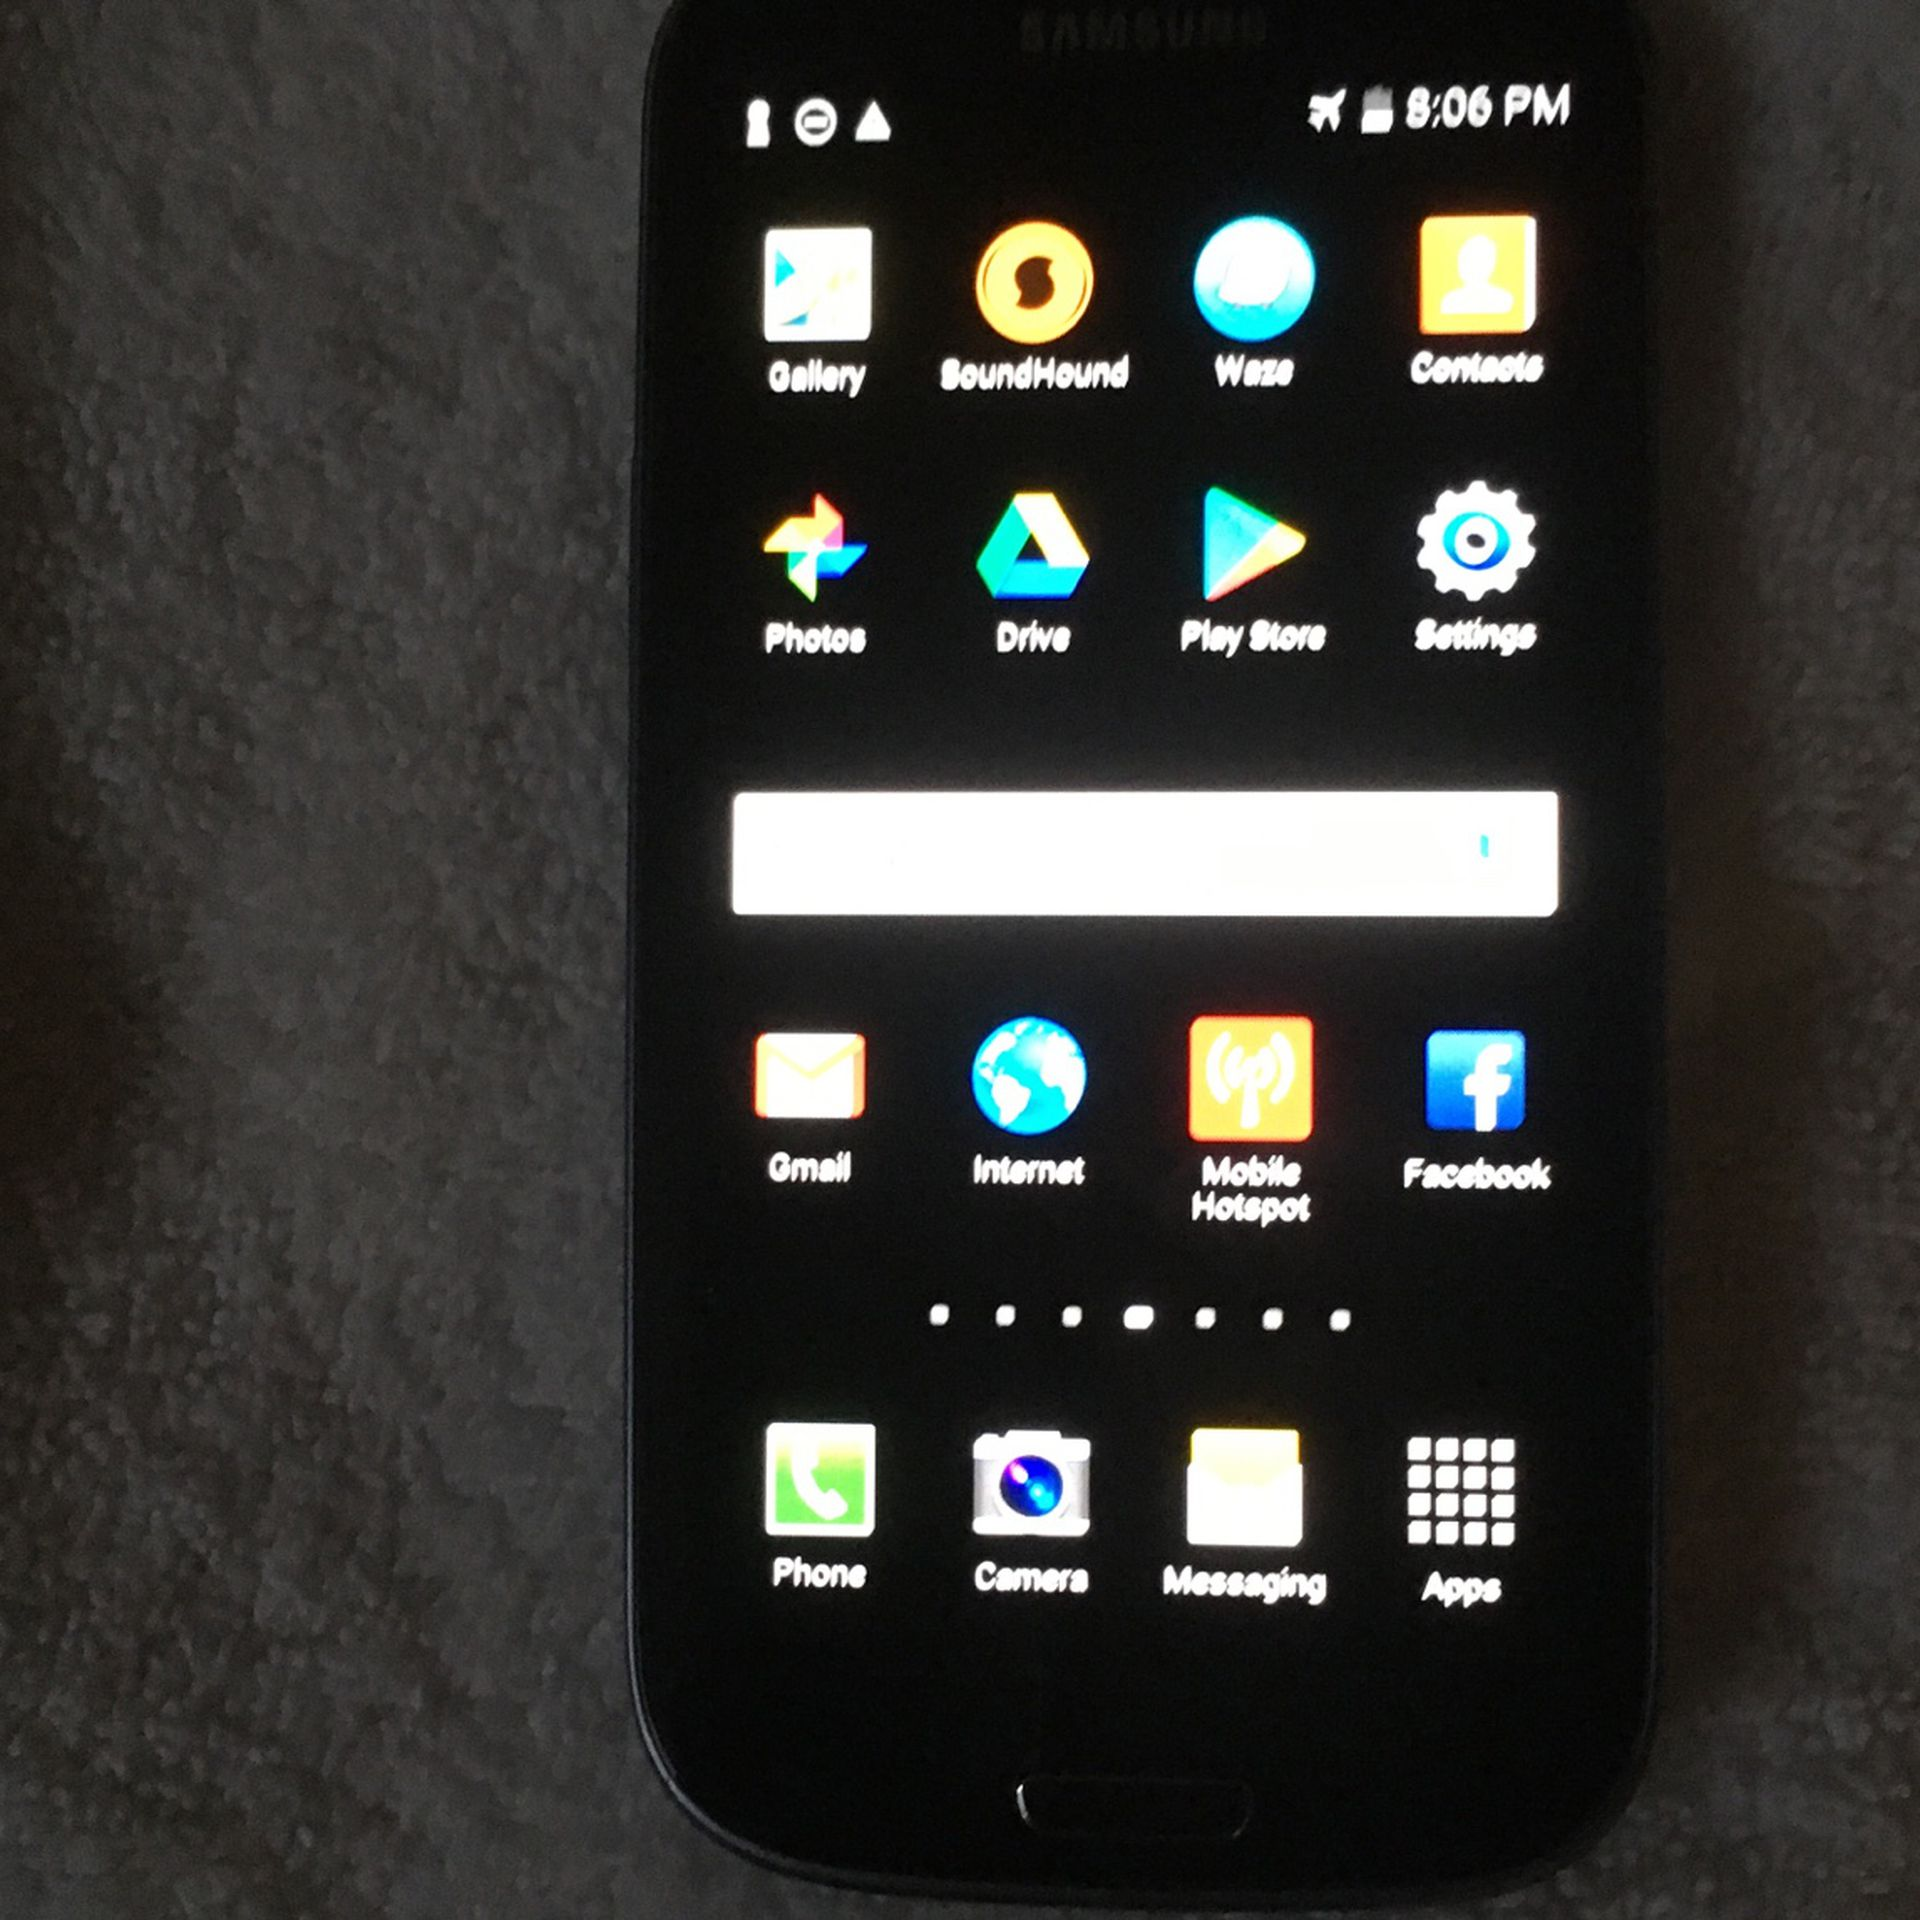 Samsung Galaxy SIII For Verizon  Factory Unlocked Mint Condition!